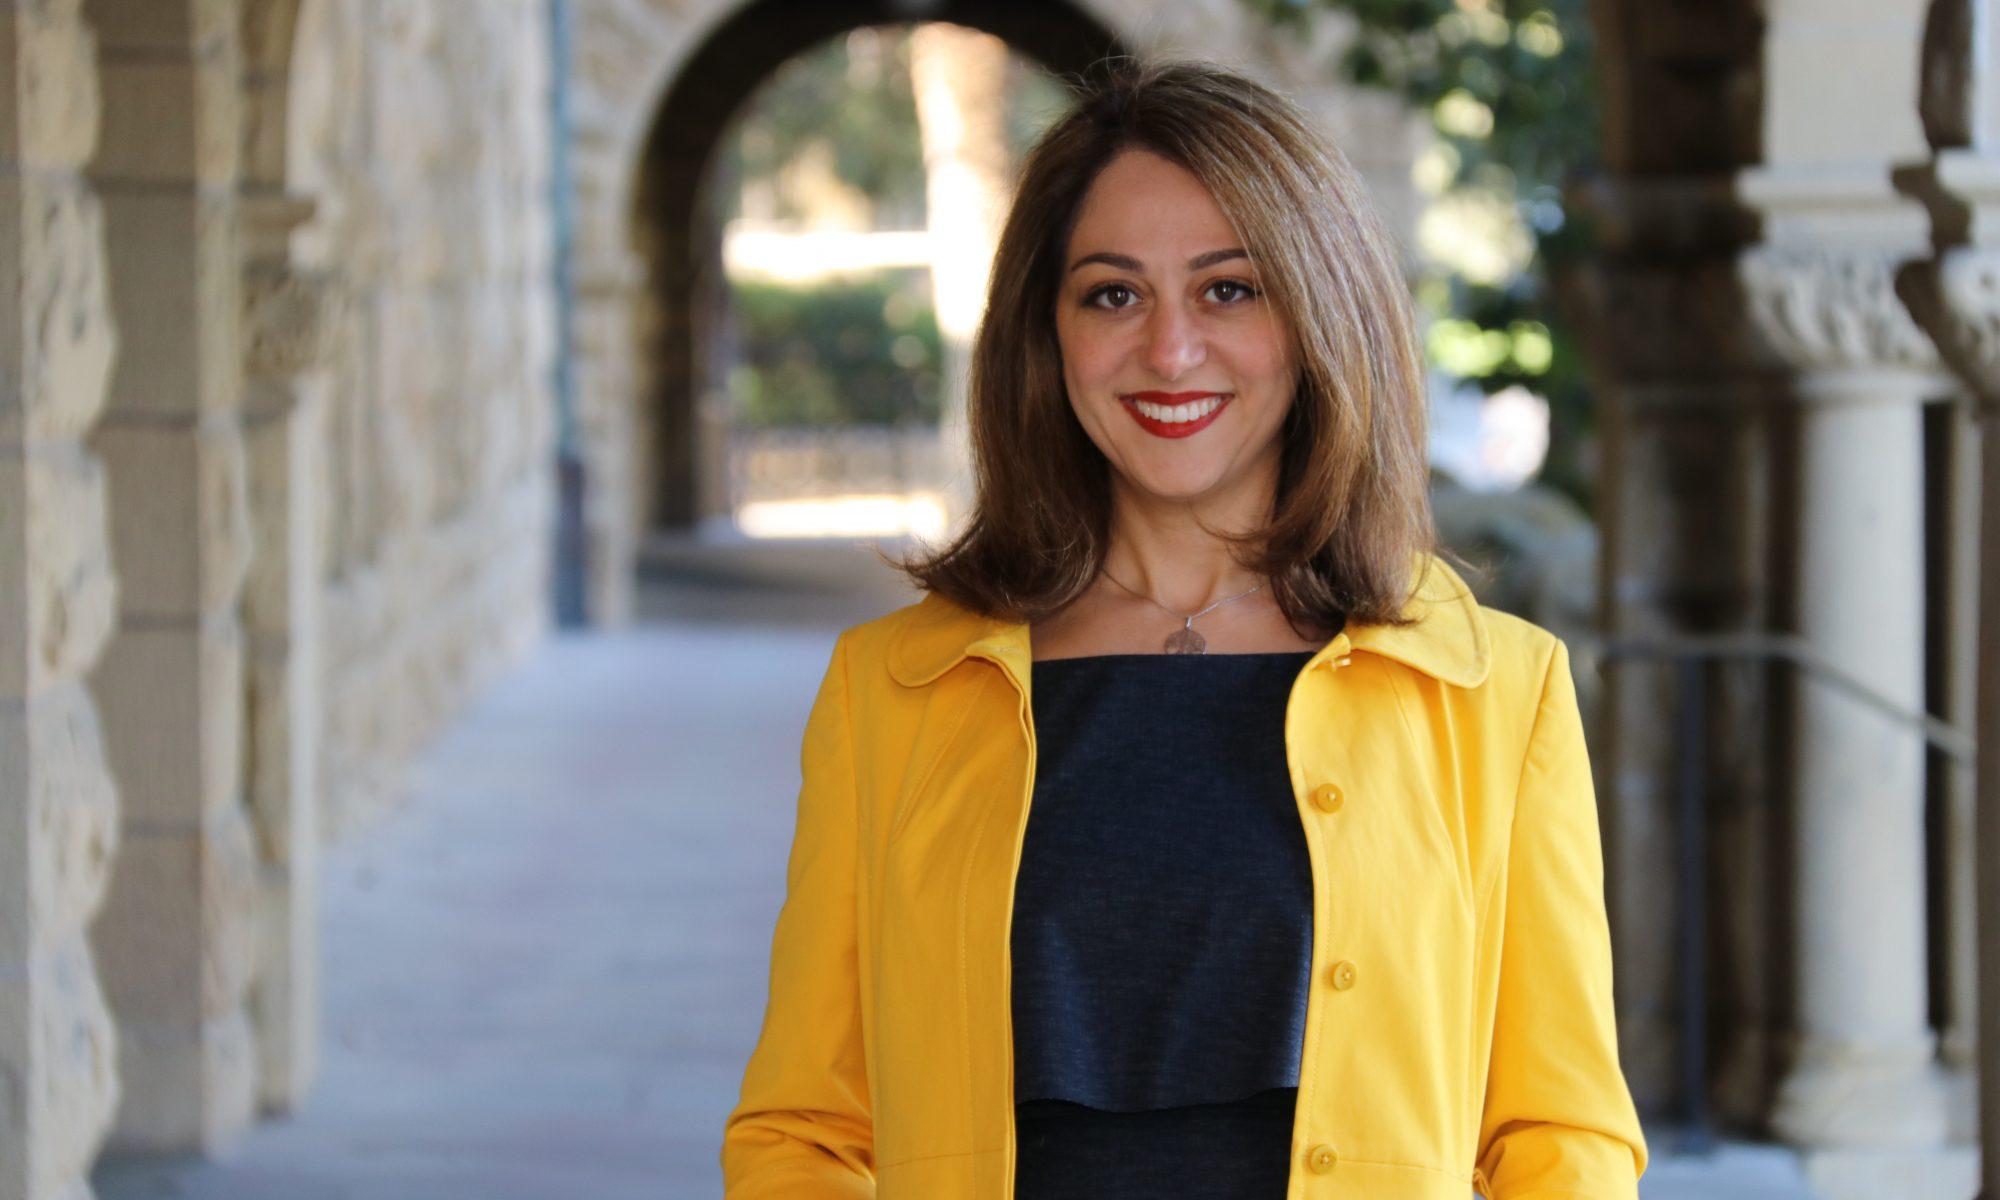 Dr. Sara Nasserzadeh